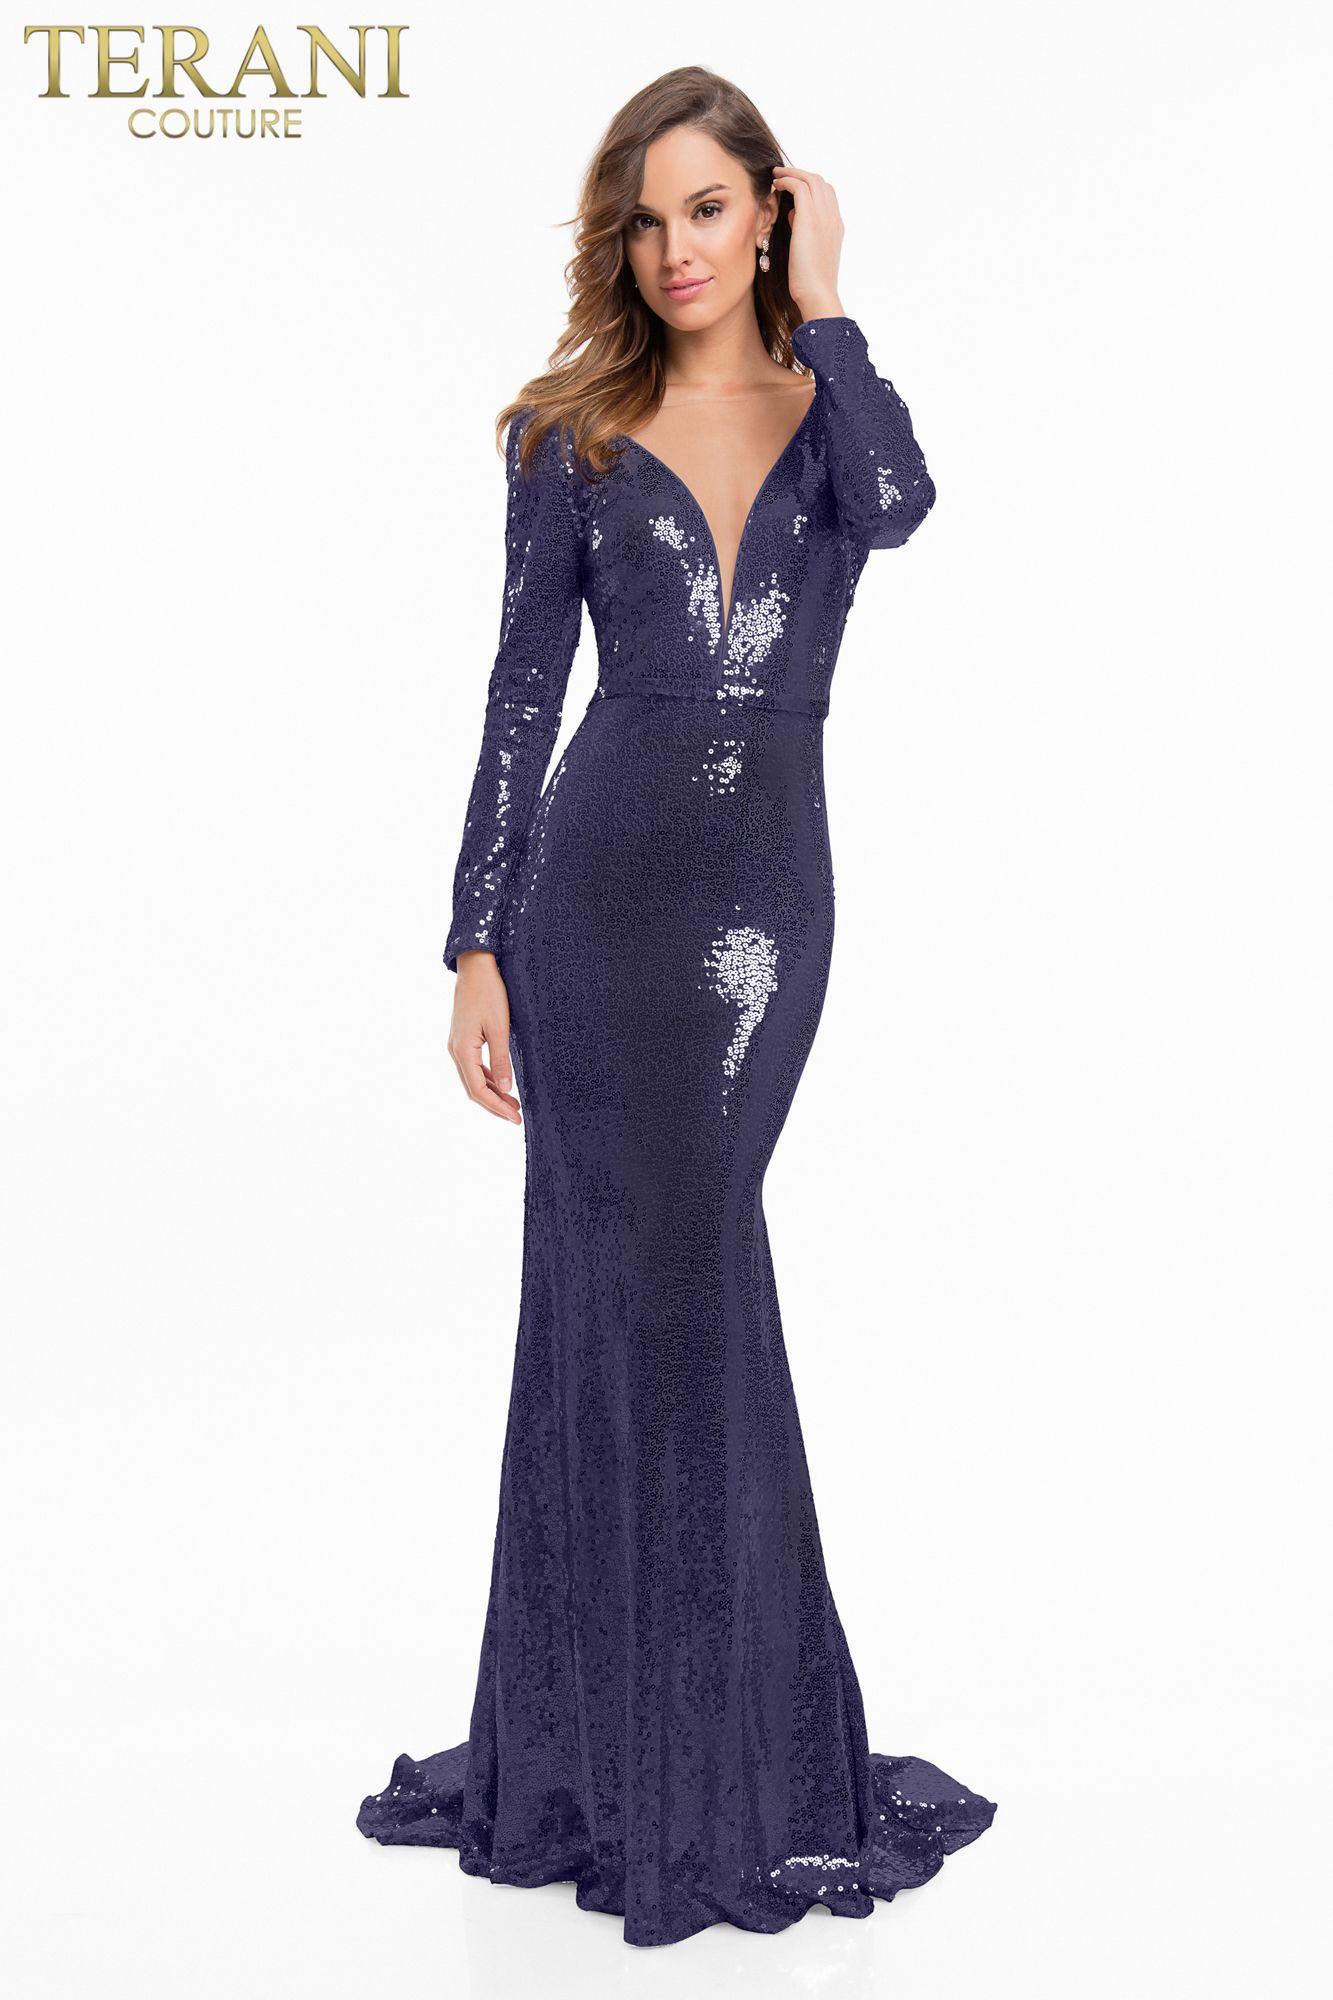 Terani couture style e dress at macktak teranicouture